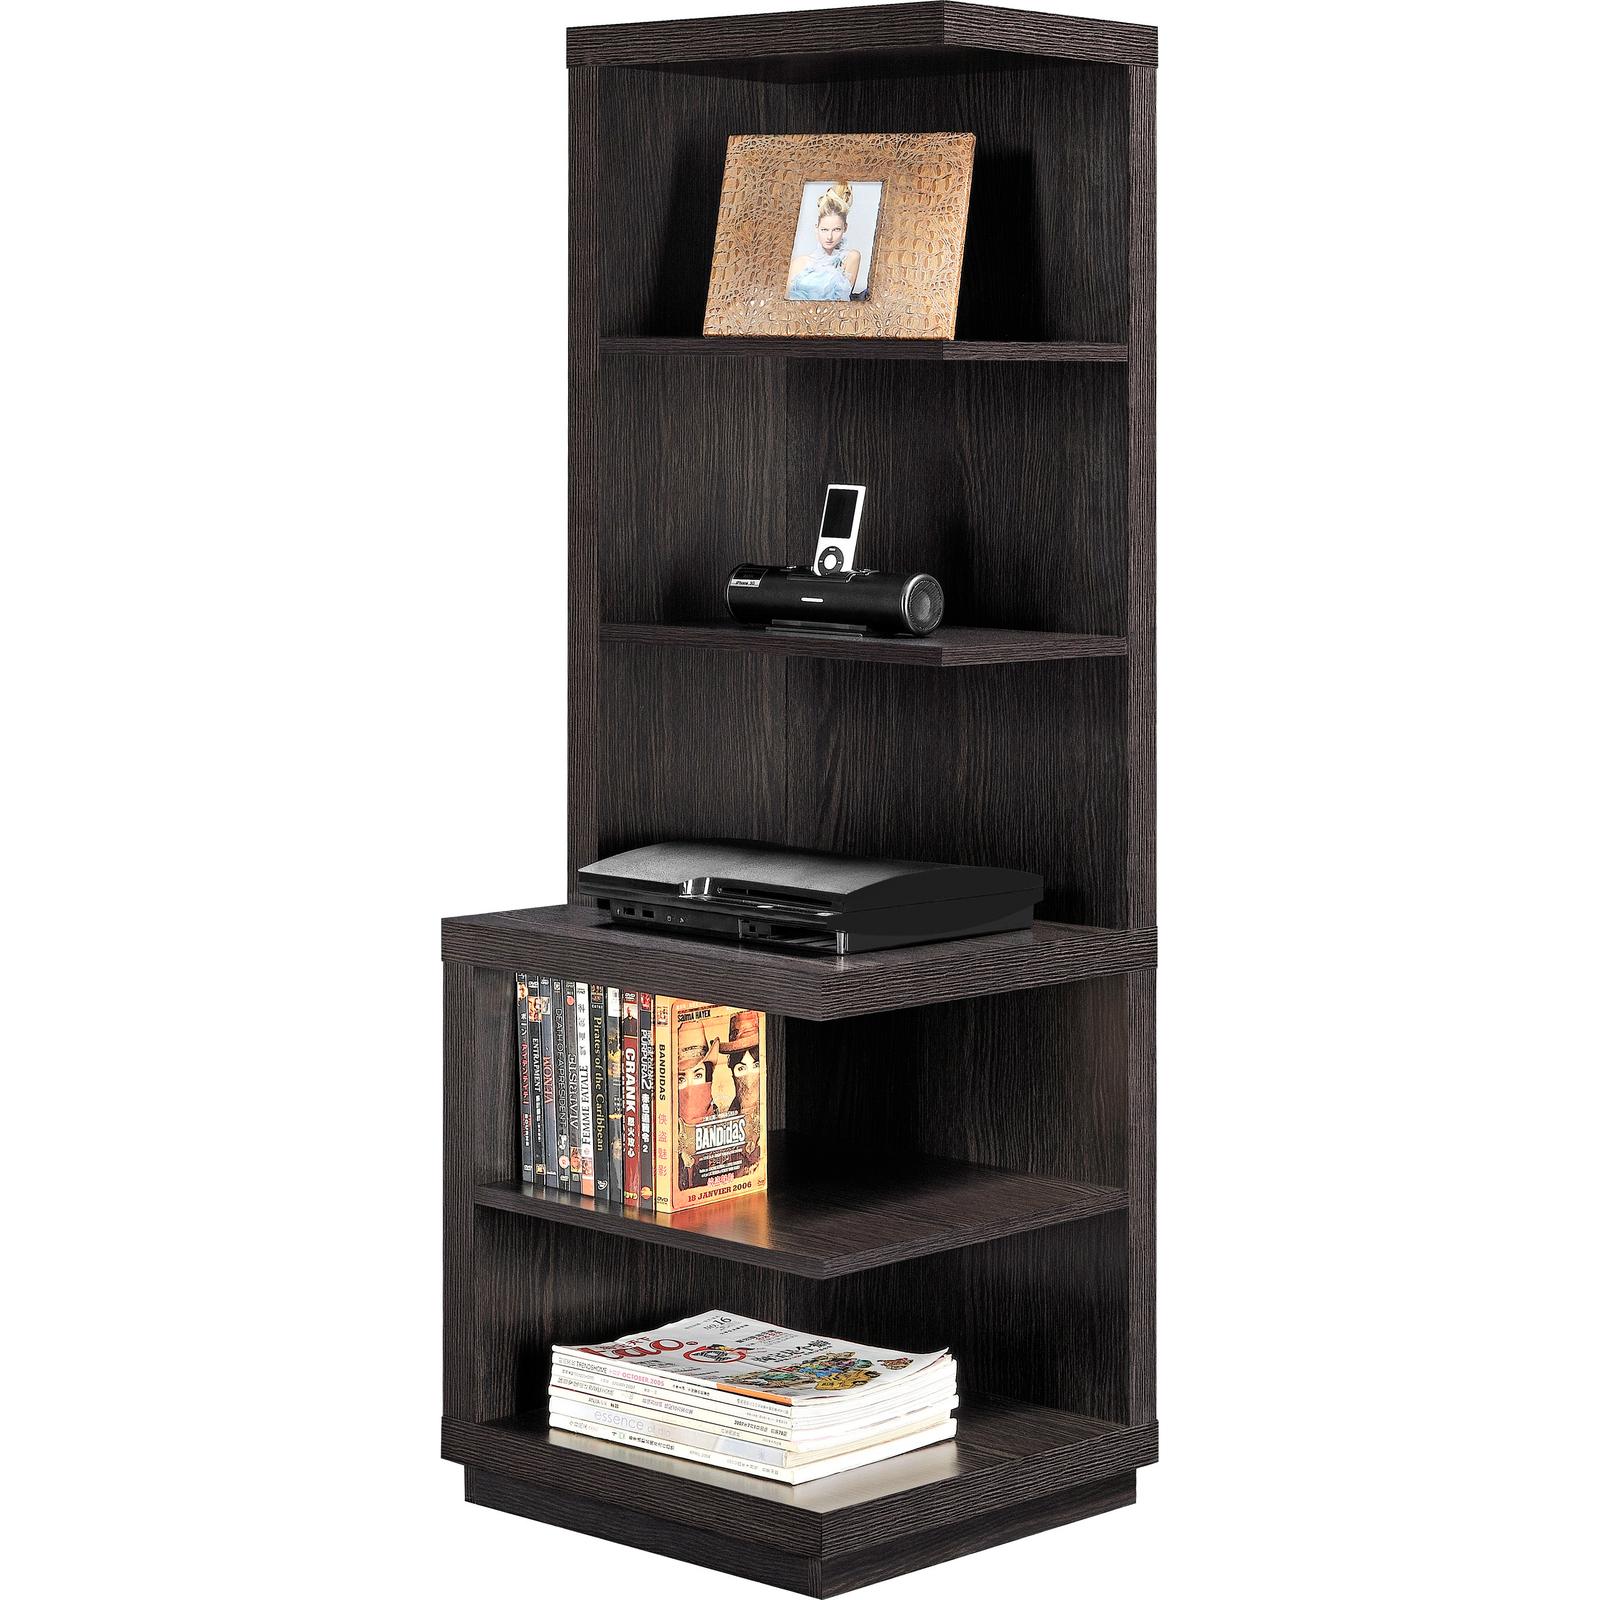 Corner Shelf Bookcase Brown Wood 5 Shelves Book Storage Display Home Furniture Bookcases